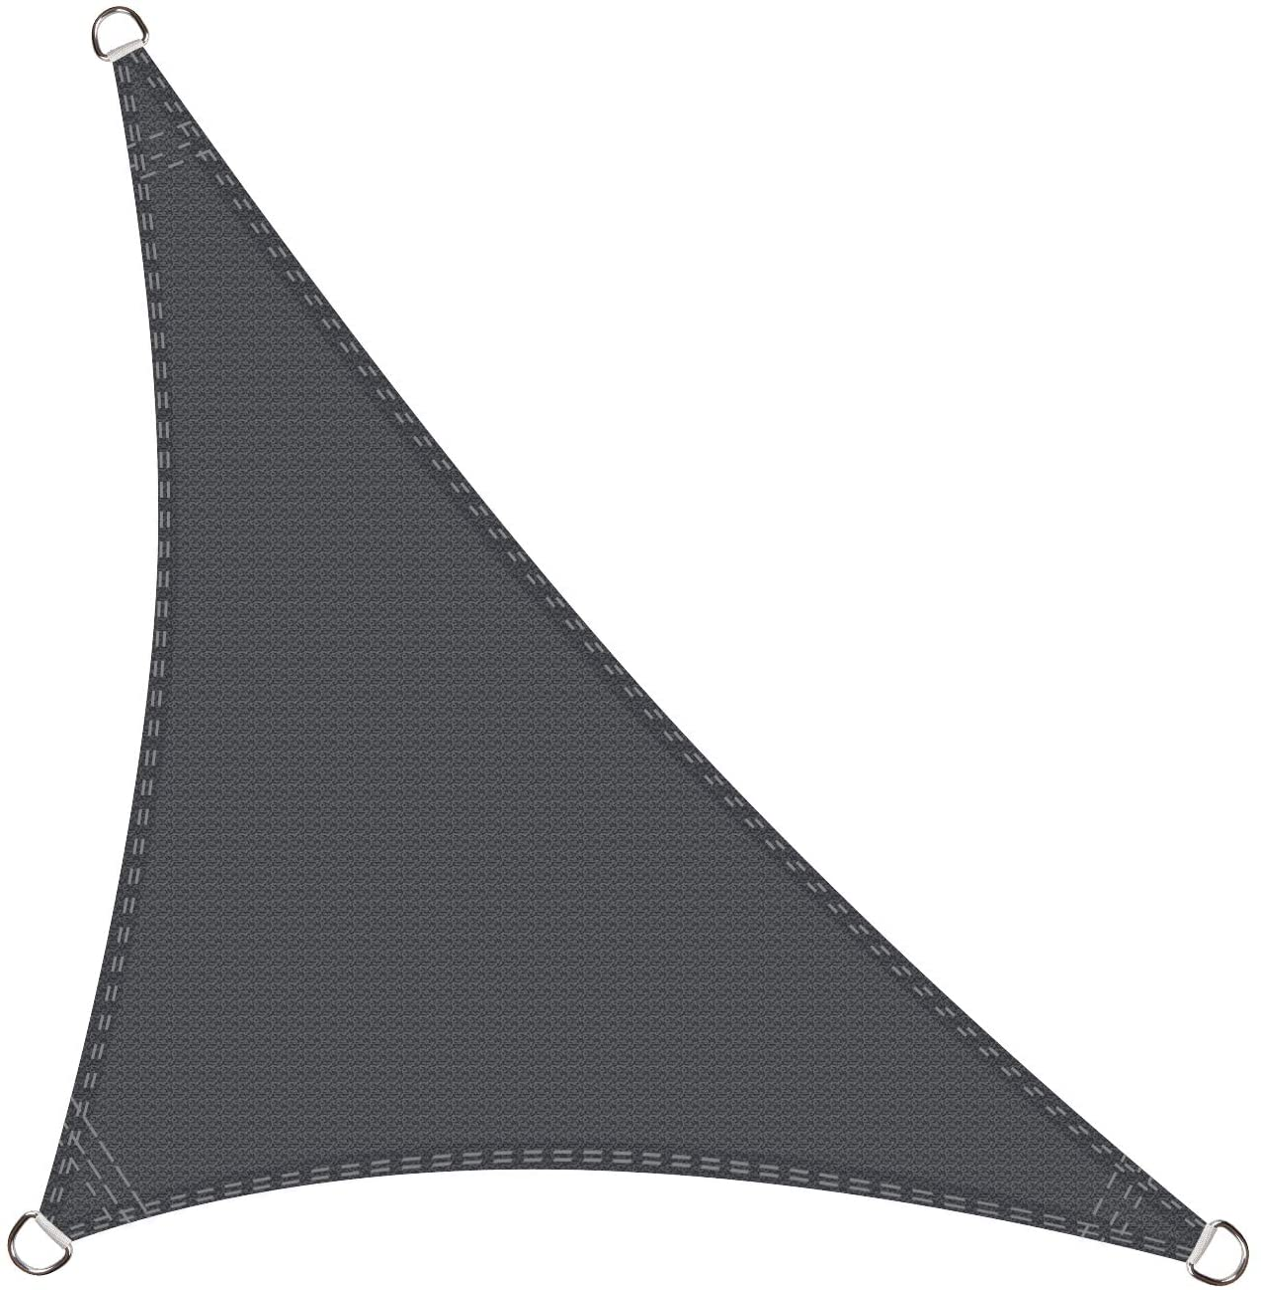 Cool Area Toldo Vela de Sombra triángulo rectángulo 5 x 5 x 7, 1 ...